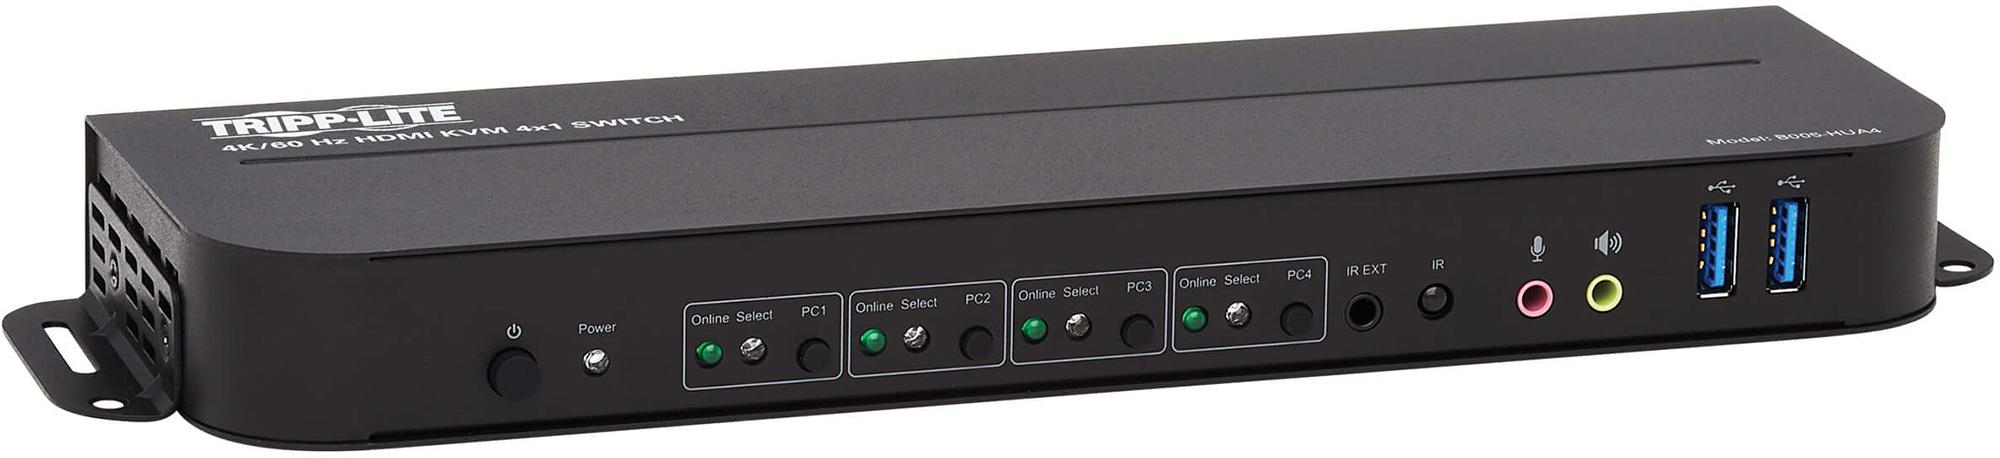 Tripp Lite B005-HUA4 4-Port HDMI/USB KVM Switch - 4K 60Hz/HDR/DCP 2.2/ IR/USB Sharing TRL-B005-HUA4